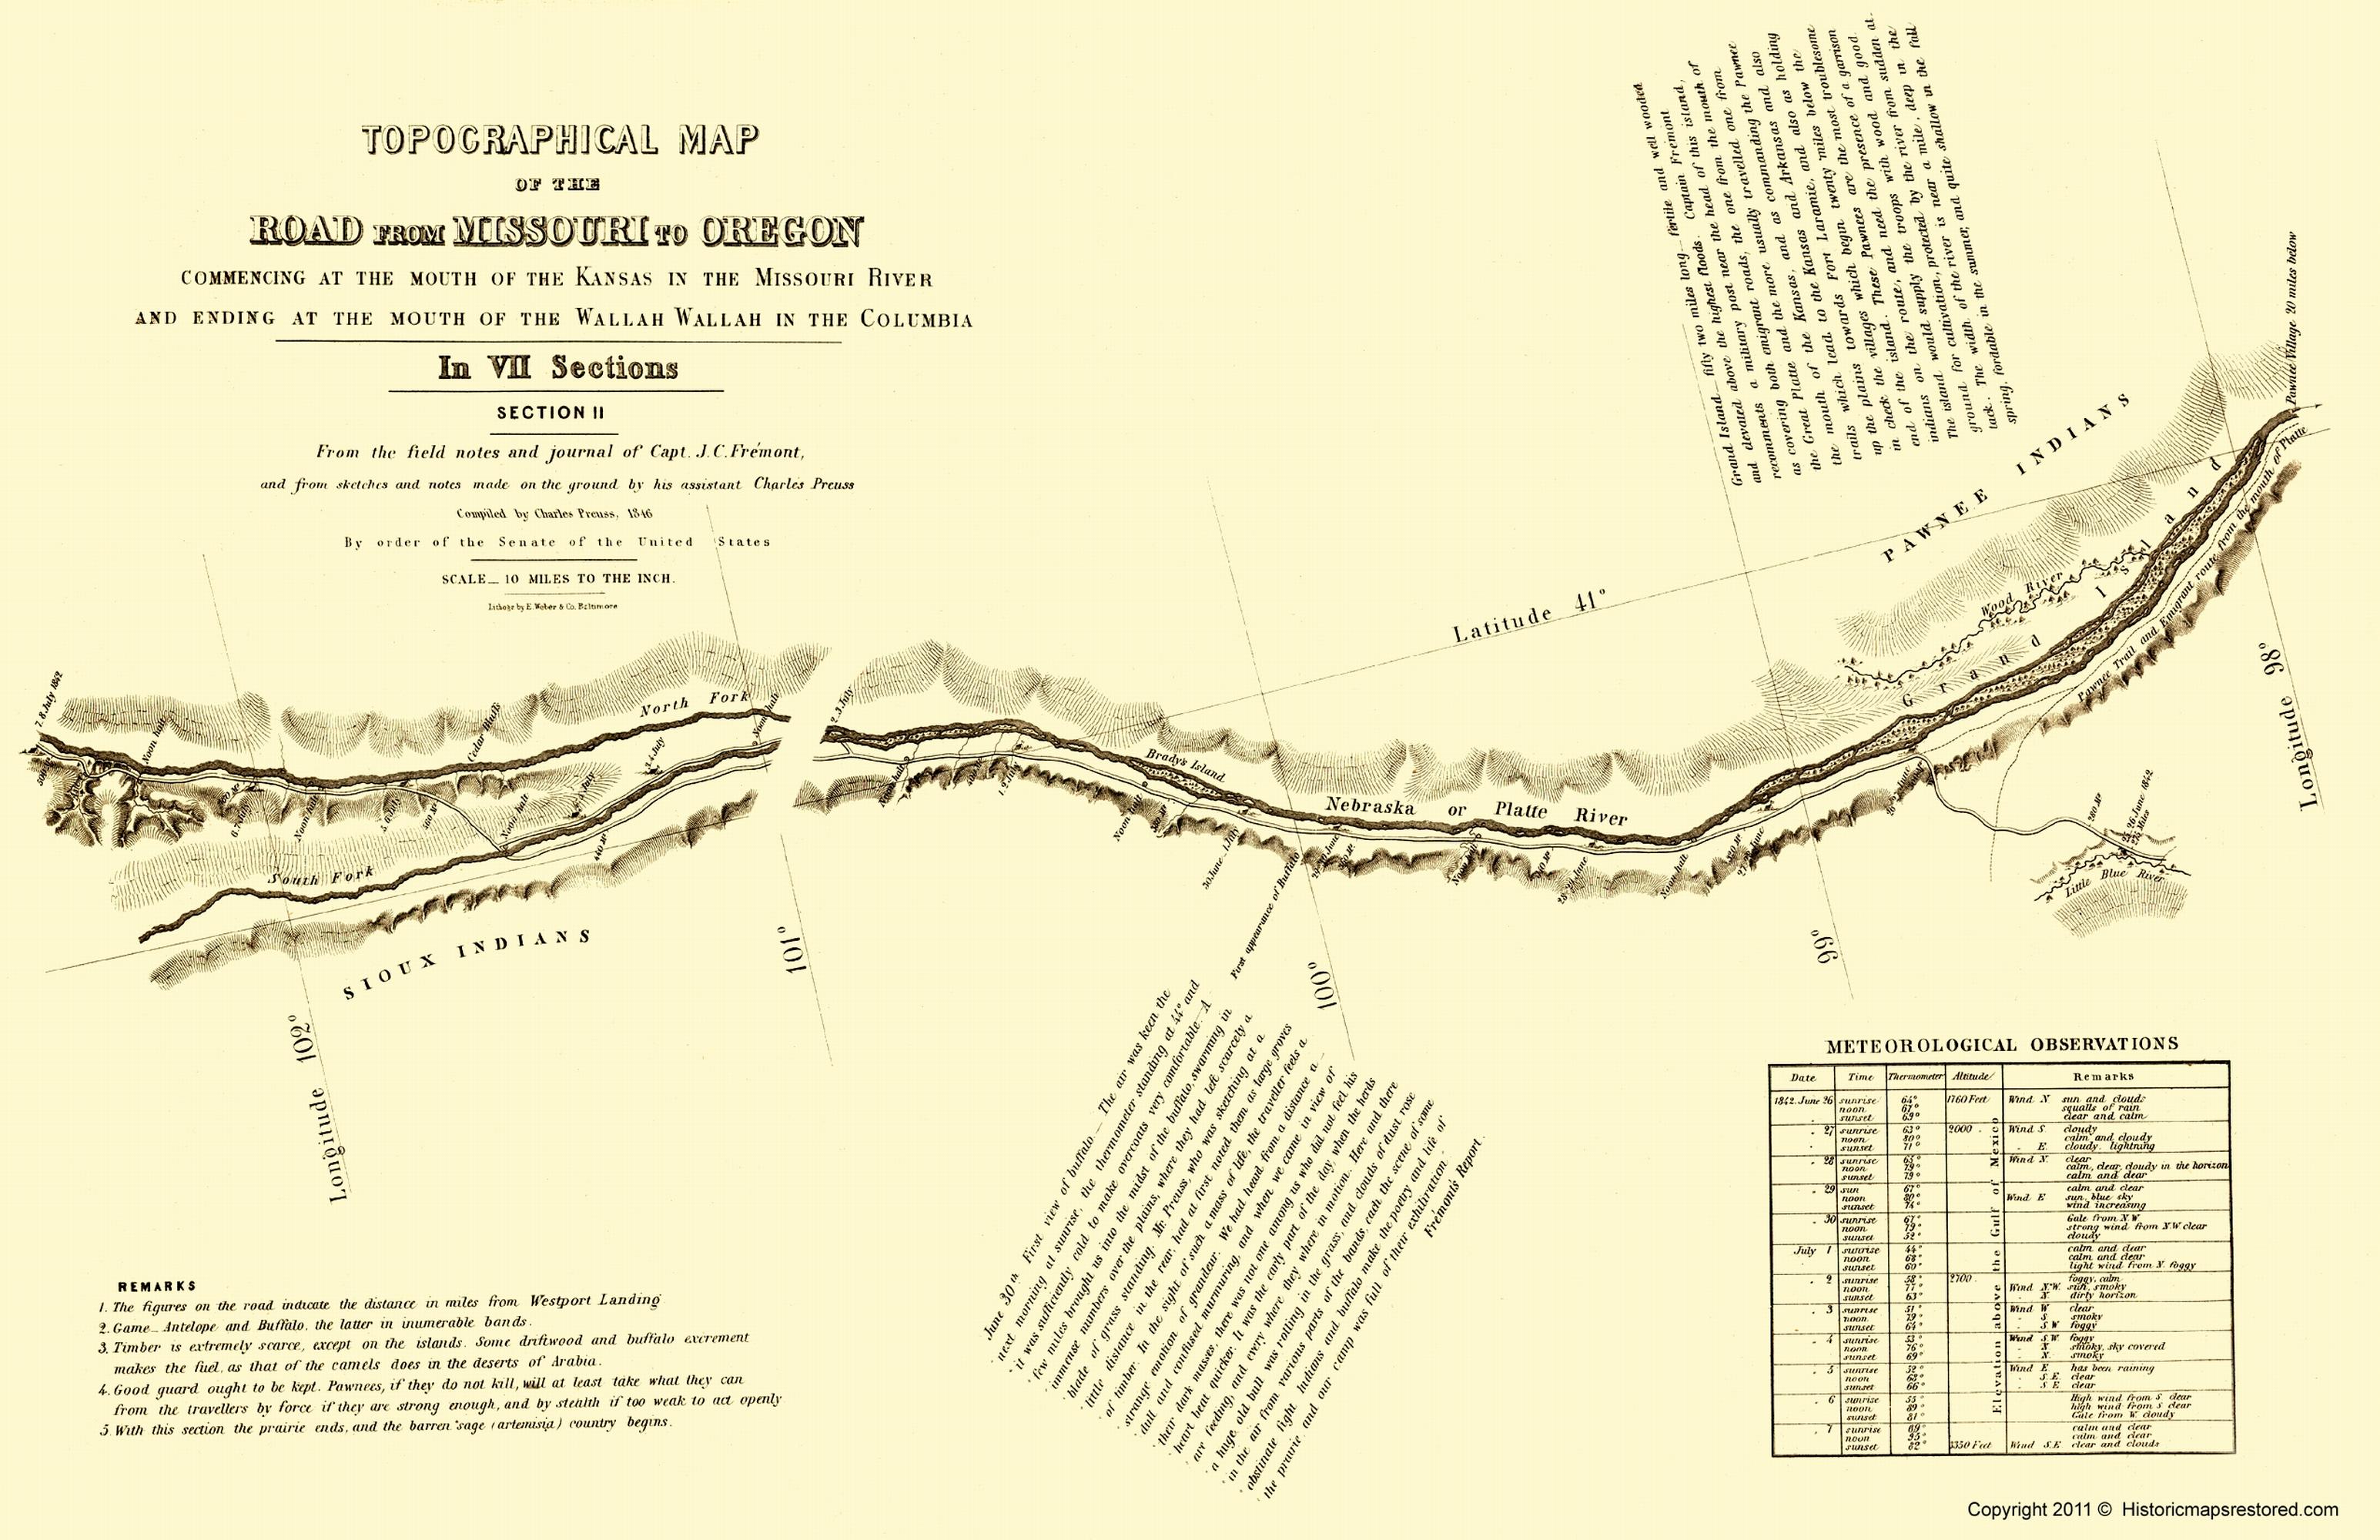 Old Topographical Map  Oregon Trail Nebraska 1846